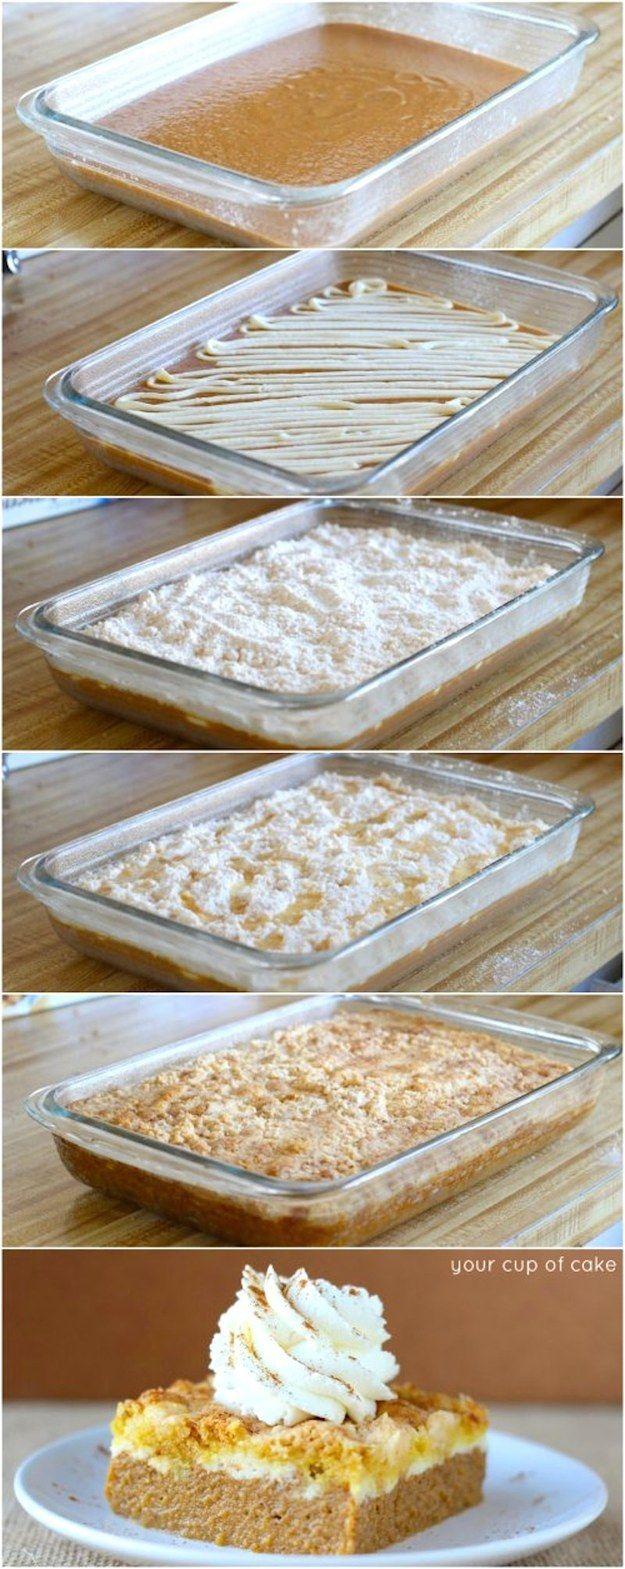 Pumpkin & Cream Cheese Dump Cake | 19 Deliciously Easy Dump Cake Recipes